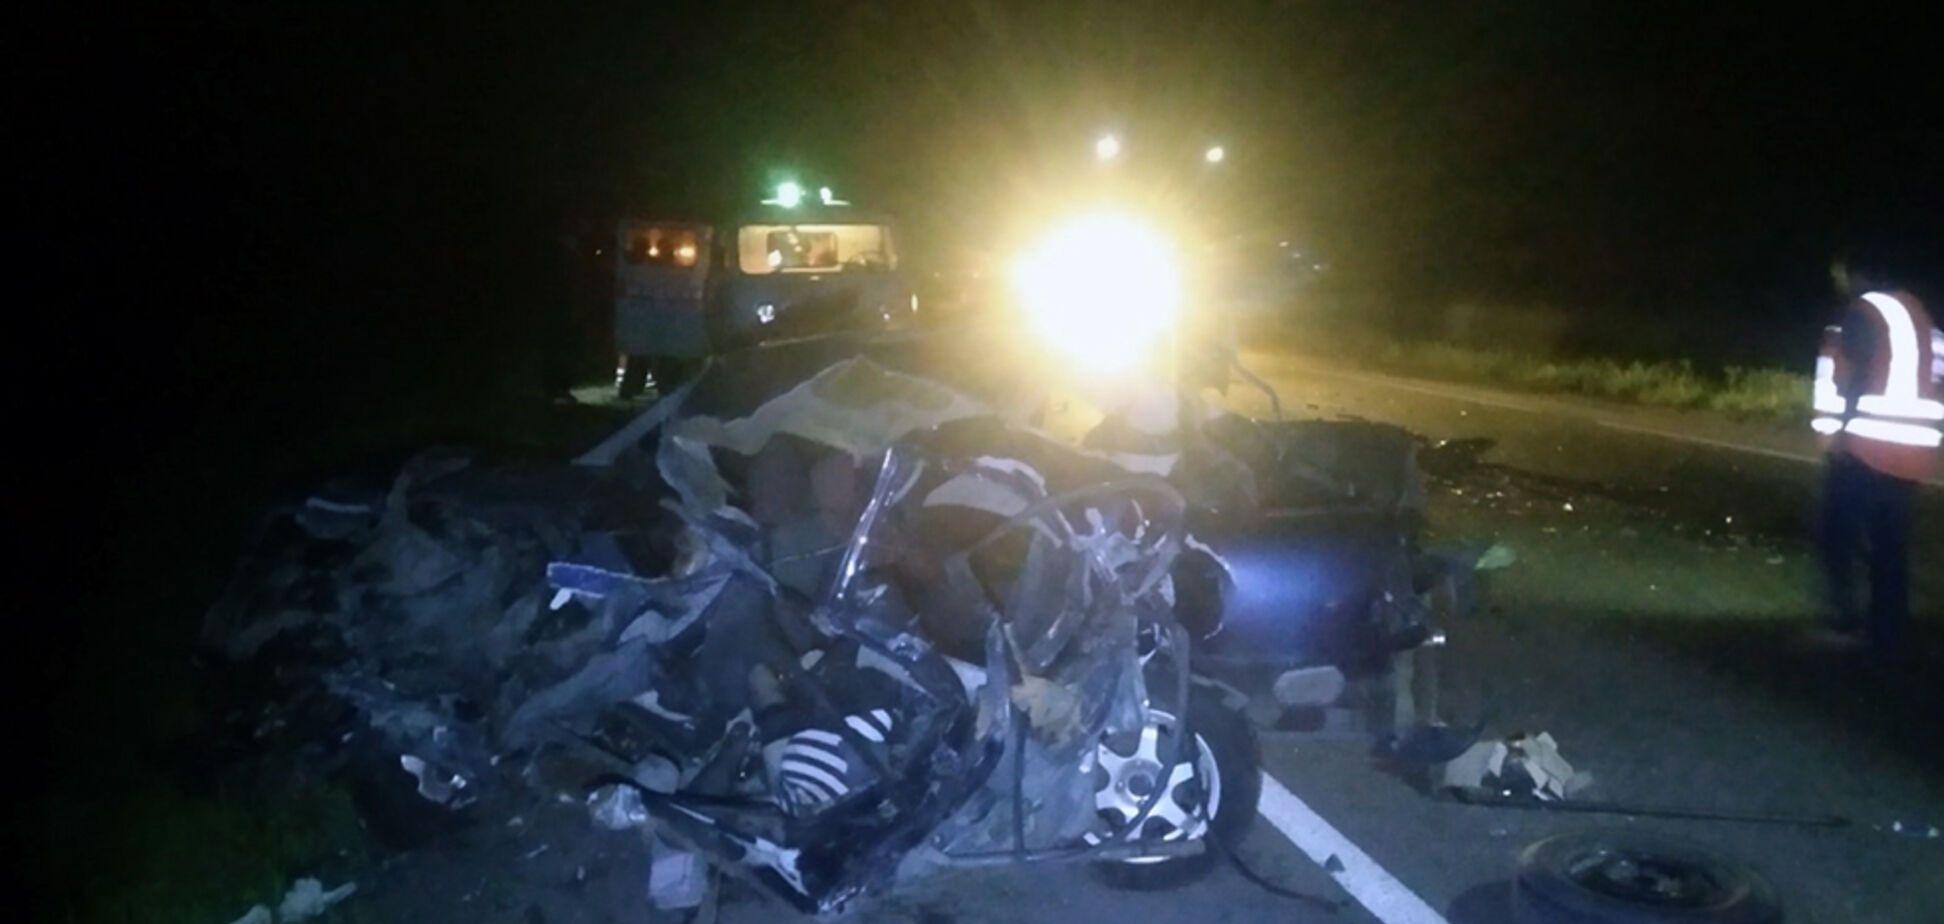 На Днепропетровщине в ночном ДТП с грузовиком погибли два человека. Фото и видео